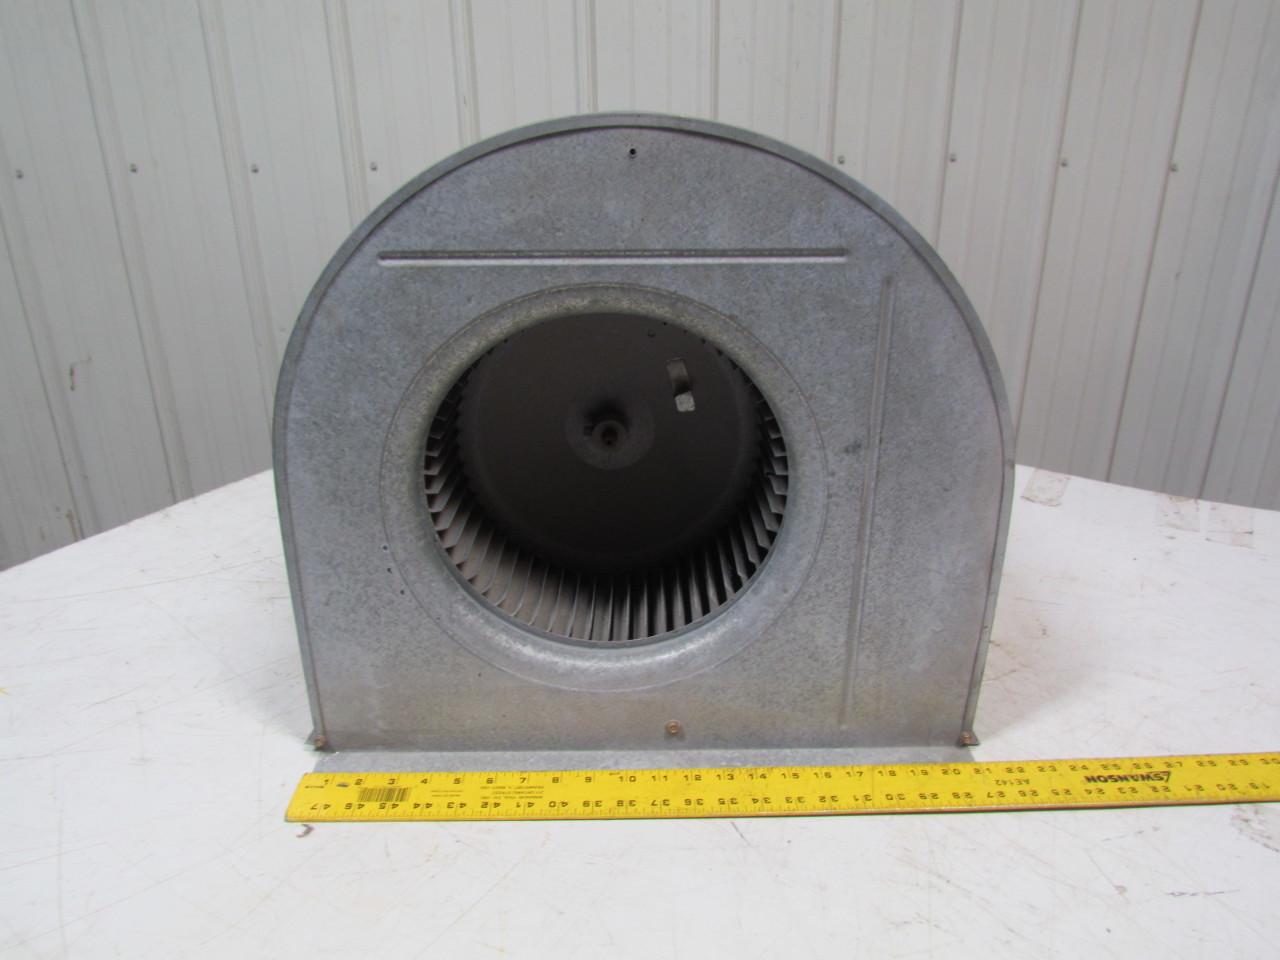 Hvac Blower Fan : Lennox squirrel cage blower furnace fan hp v